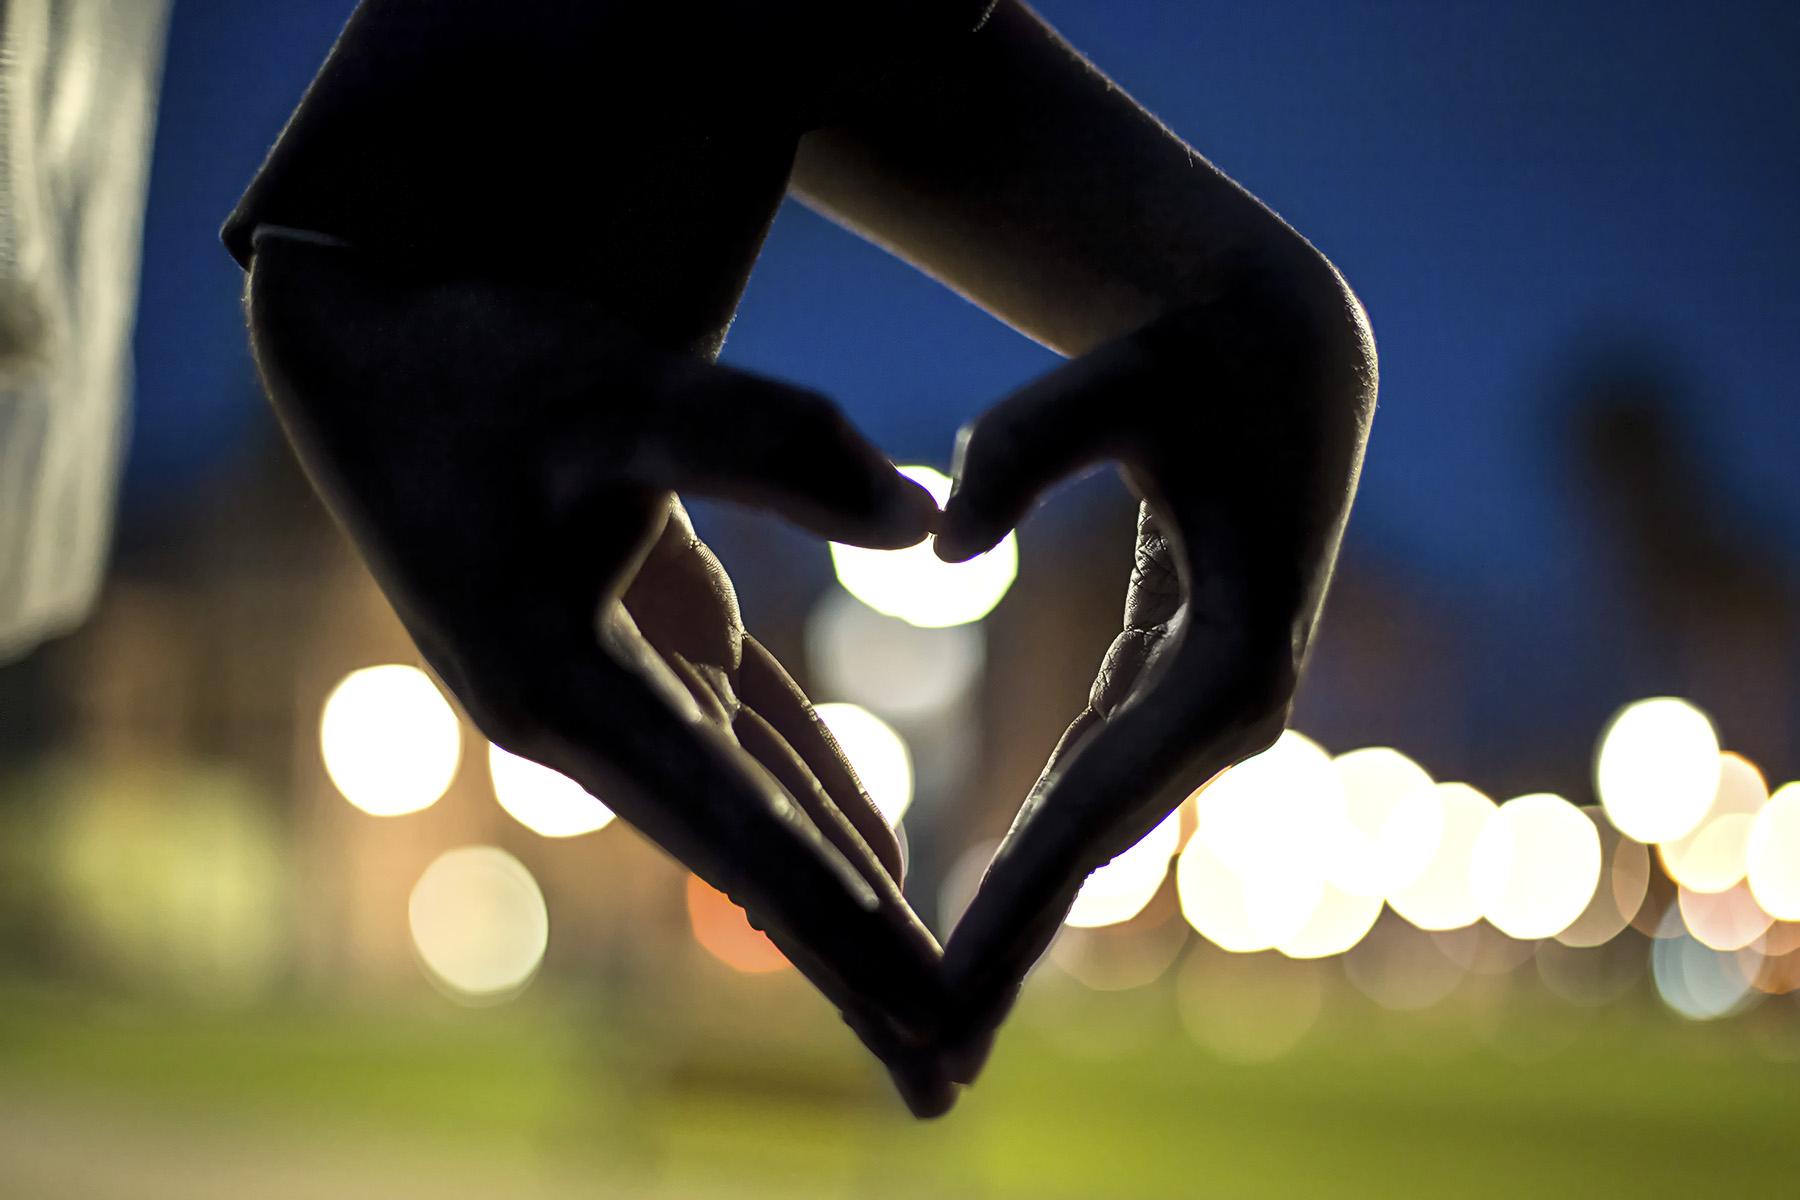 twilight wedding photography glenelg beach - silhouette love hands